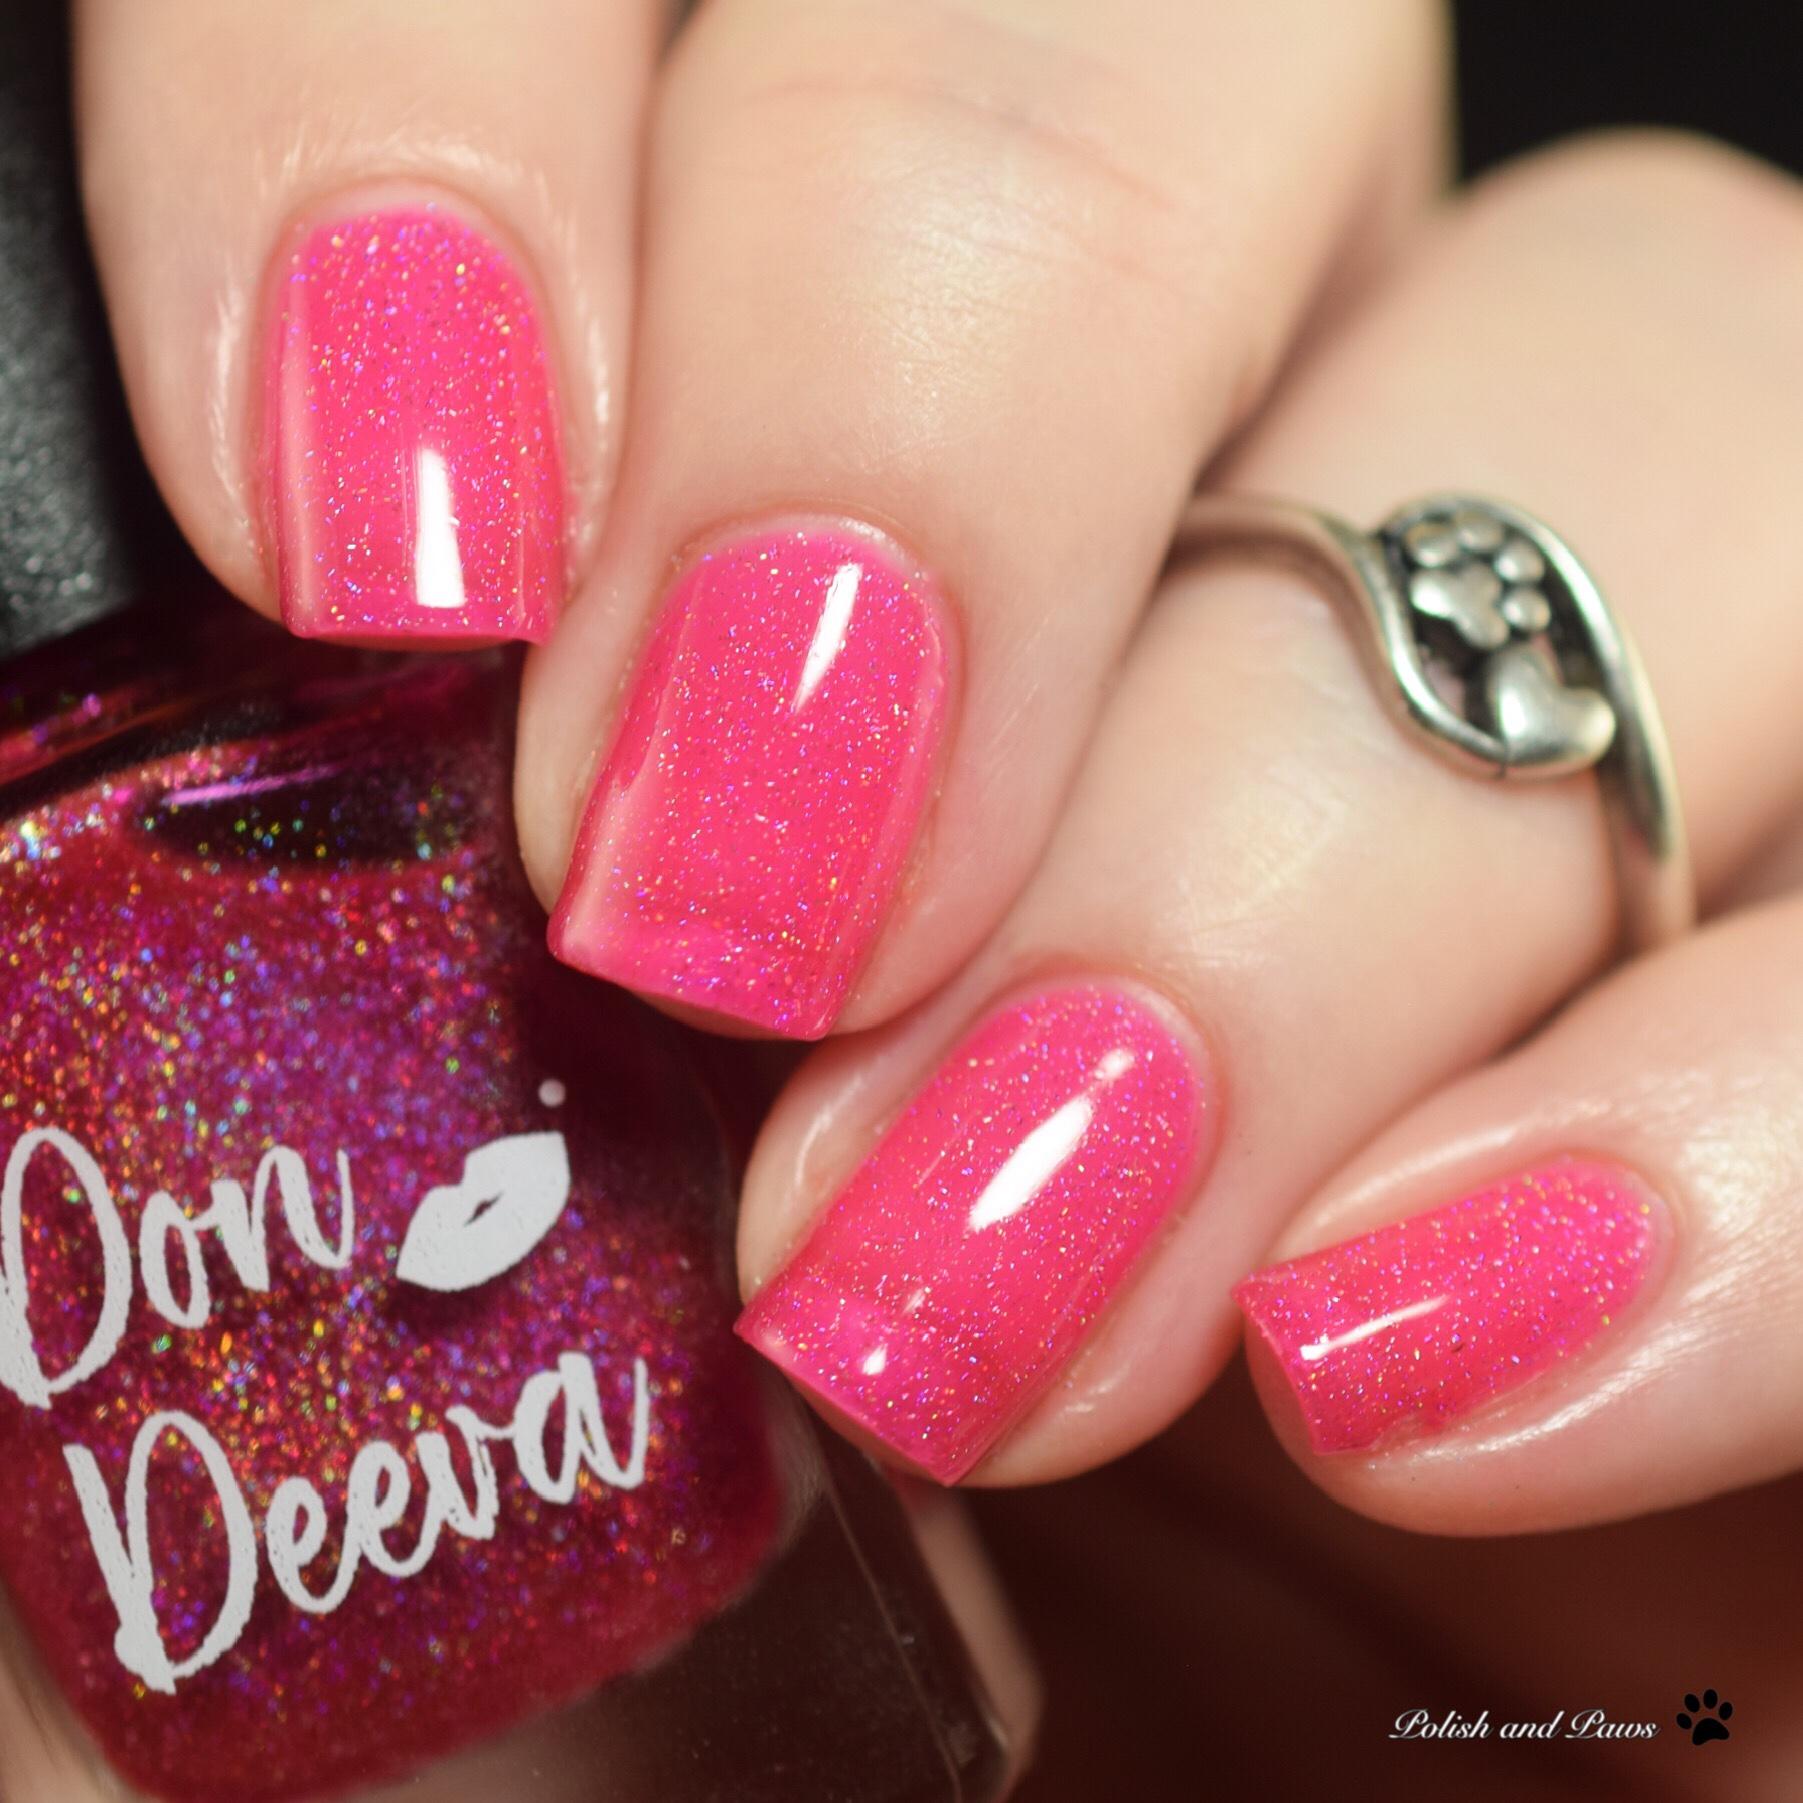 Don Deeva April Loves to Sparkle 2.0